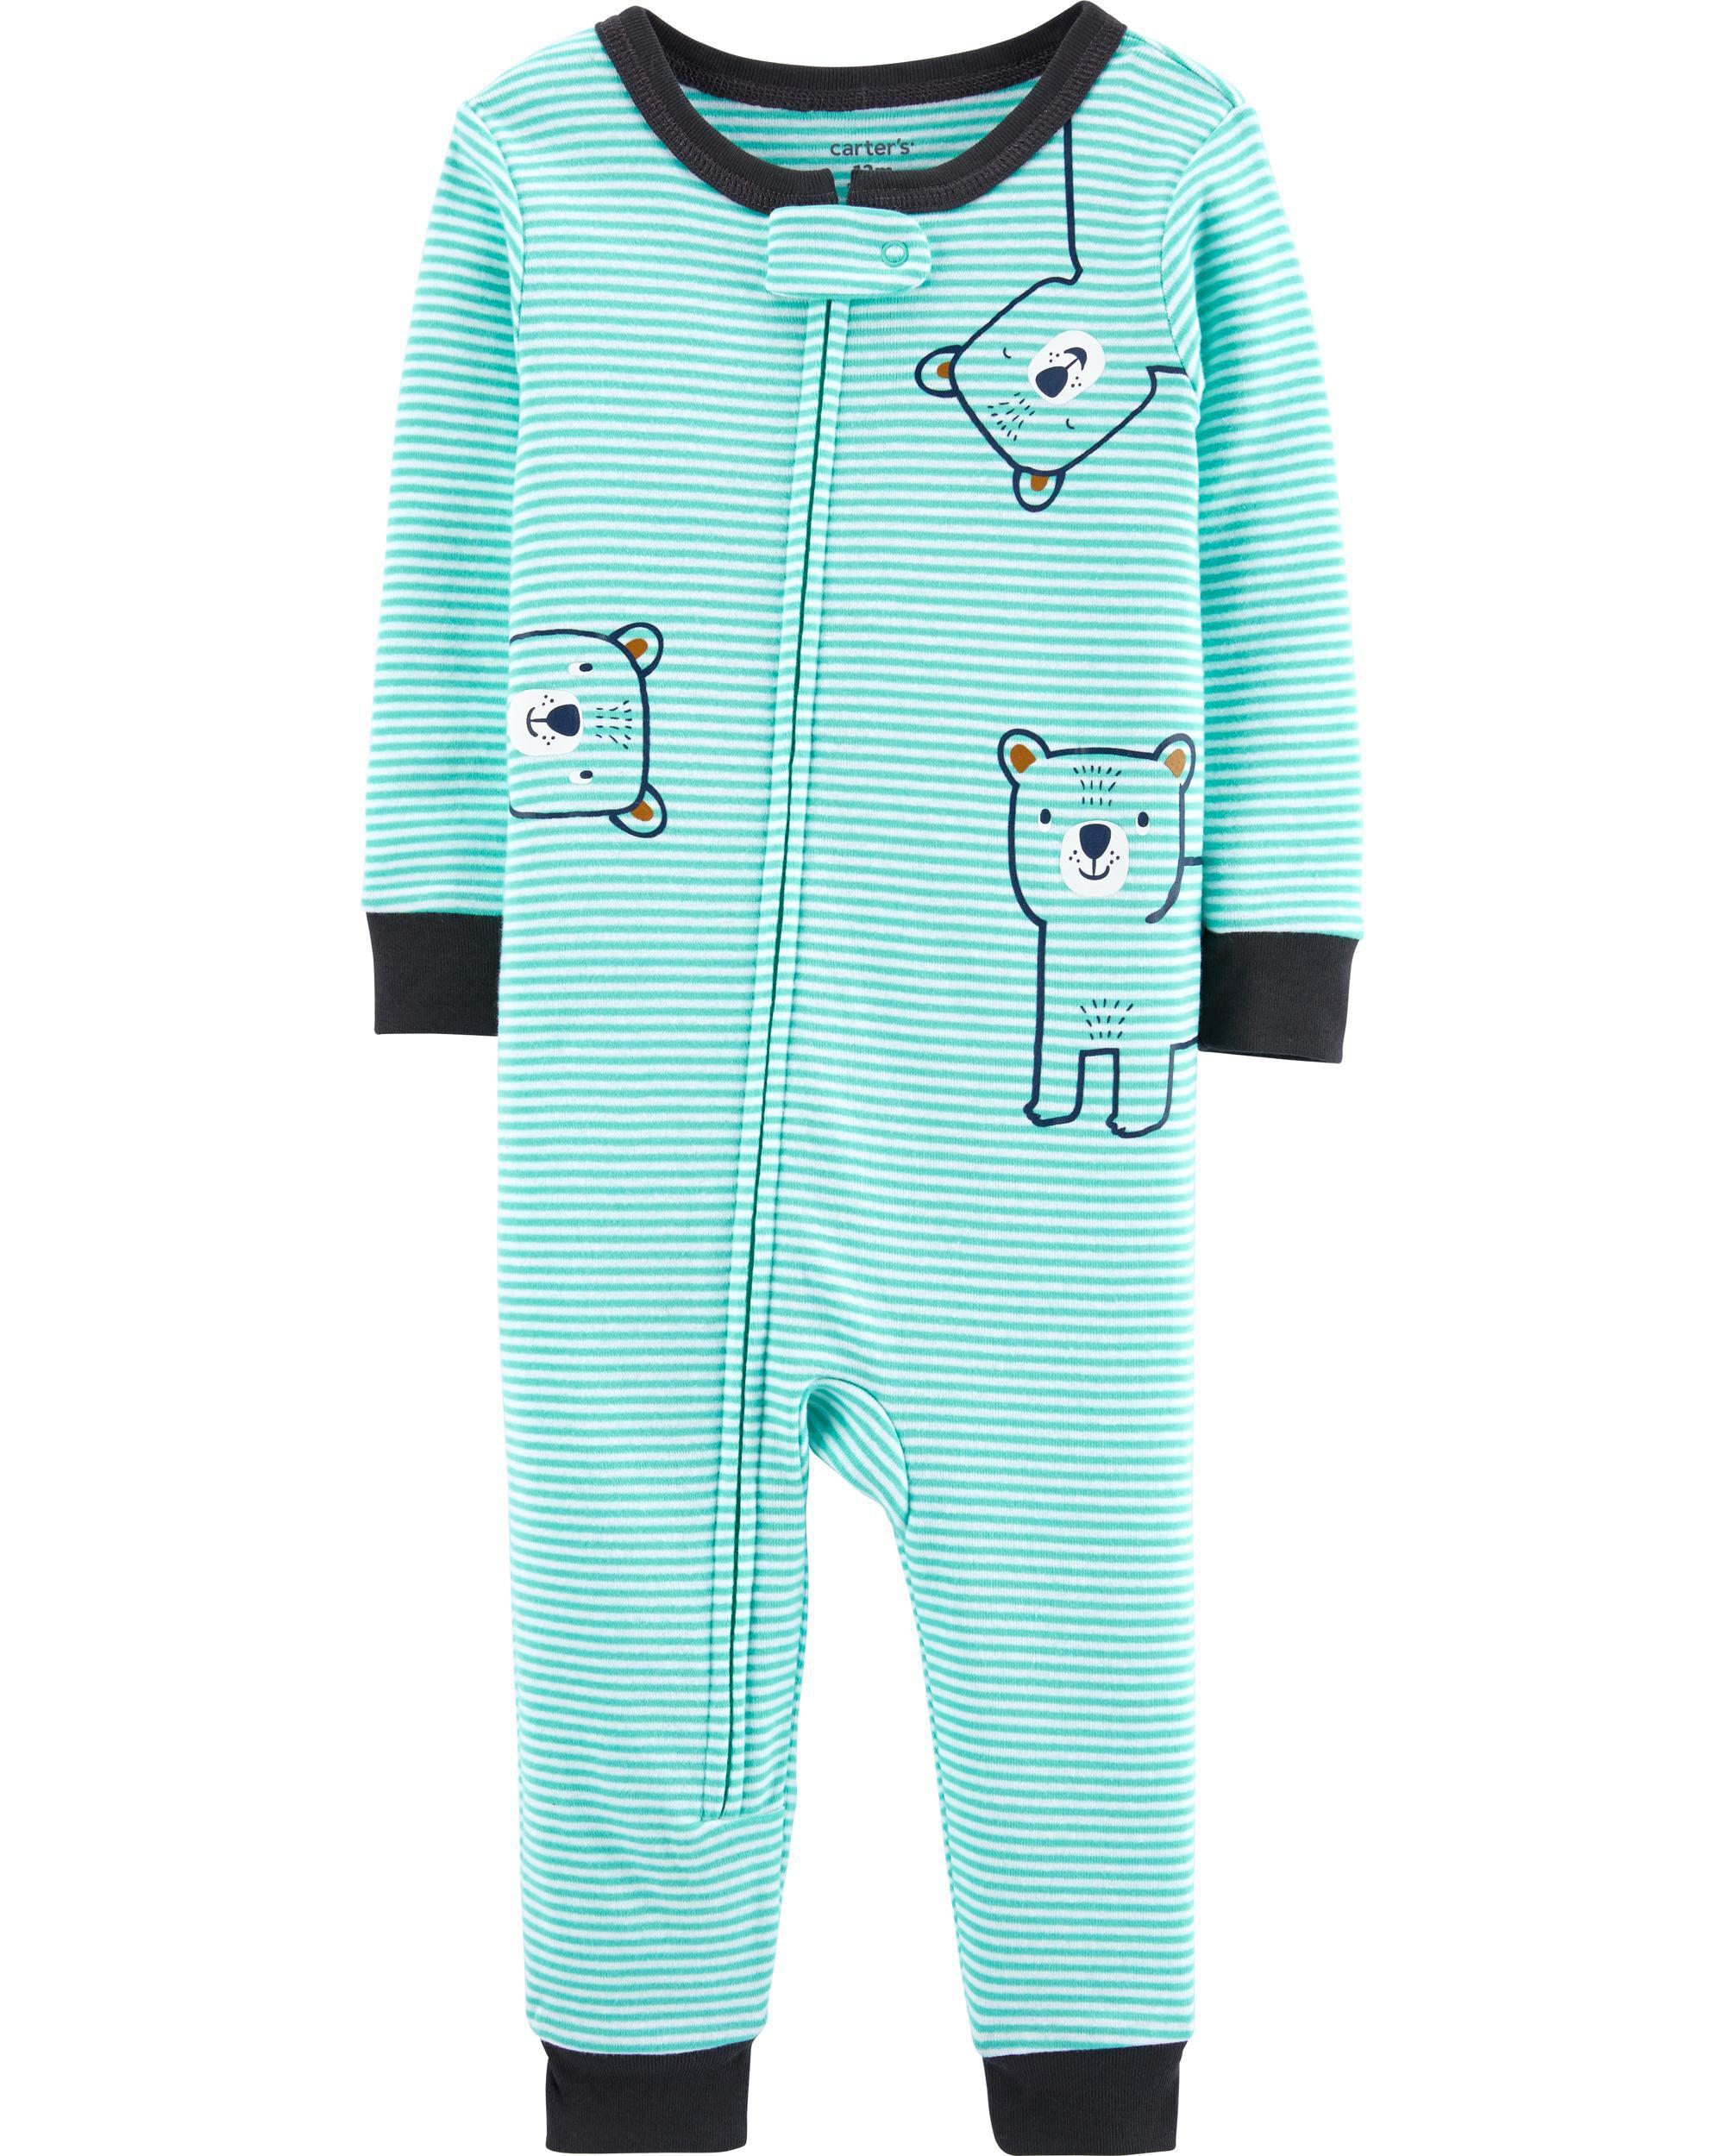 1-Piece Bear Snug Fit Cotton Footless PJs